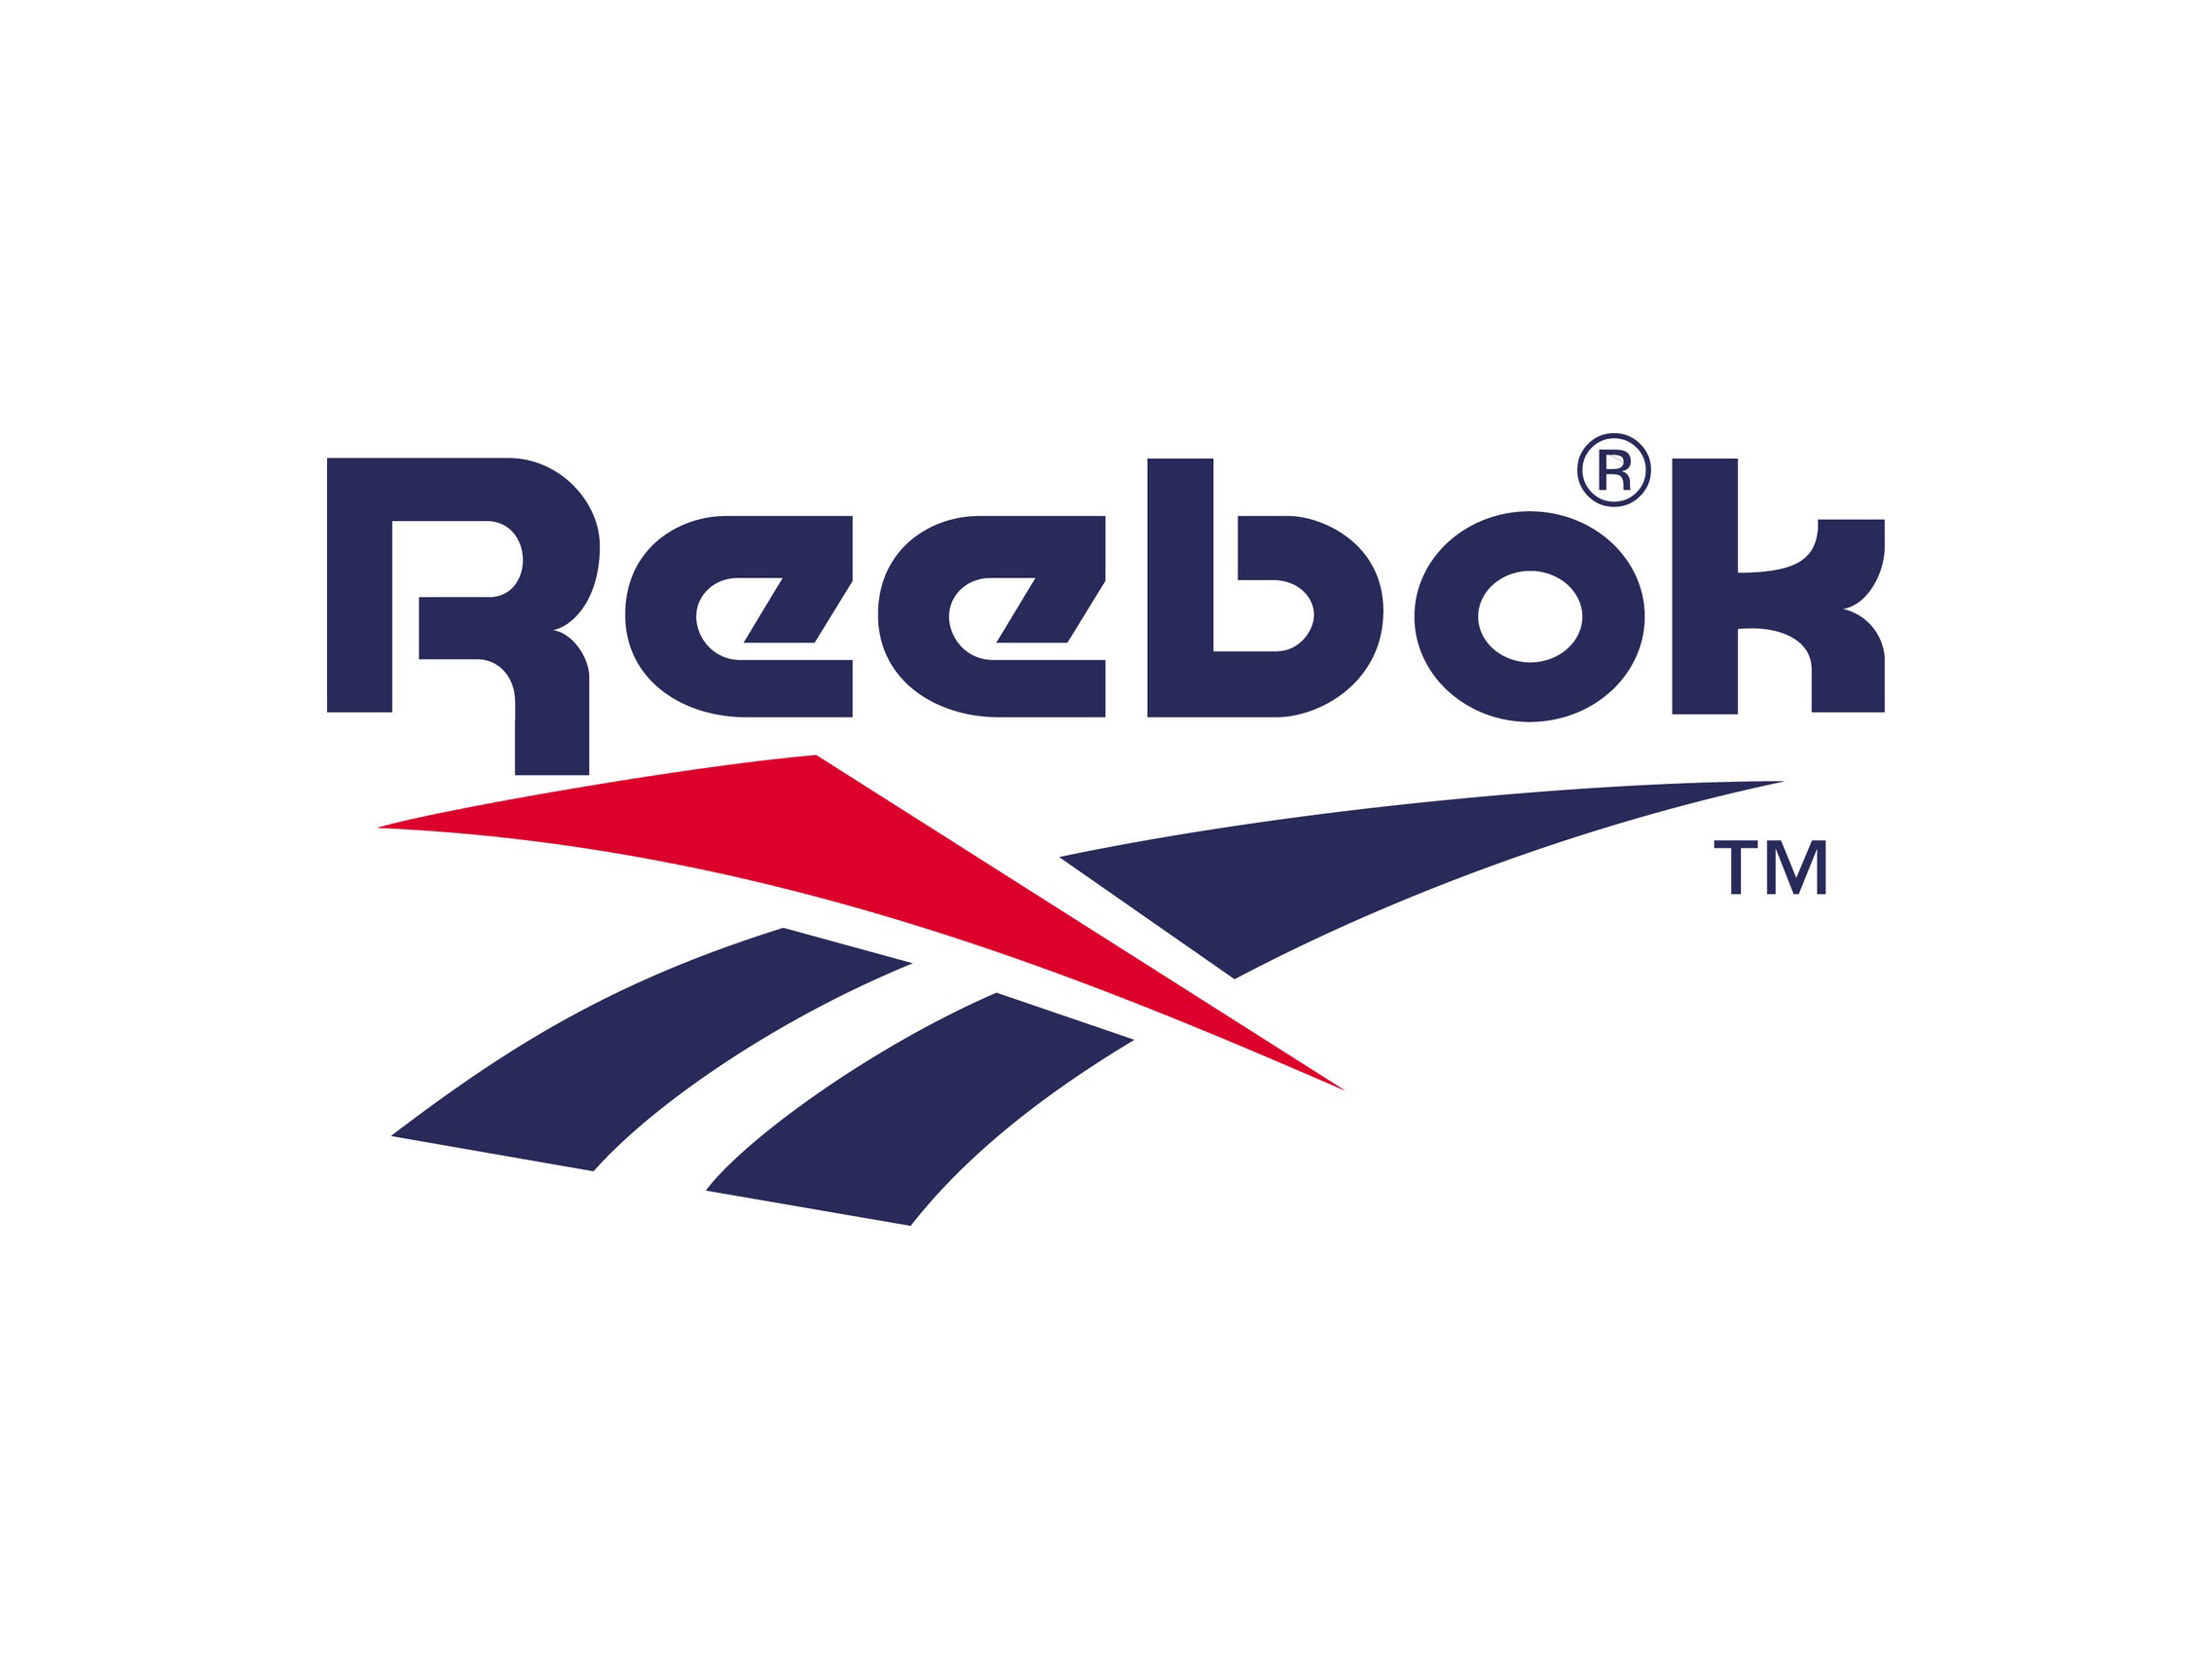 Reebok logo hd ololoshenka pinterest reebok reebok logo hd buycottarizona Image collections